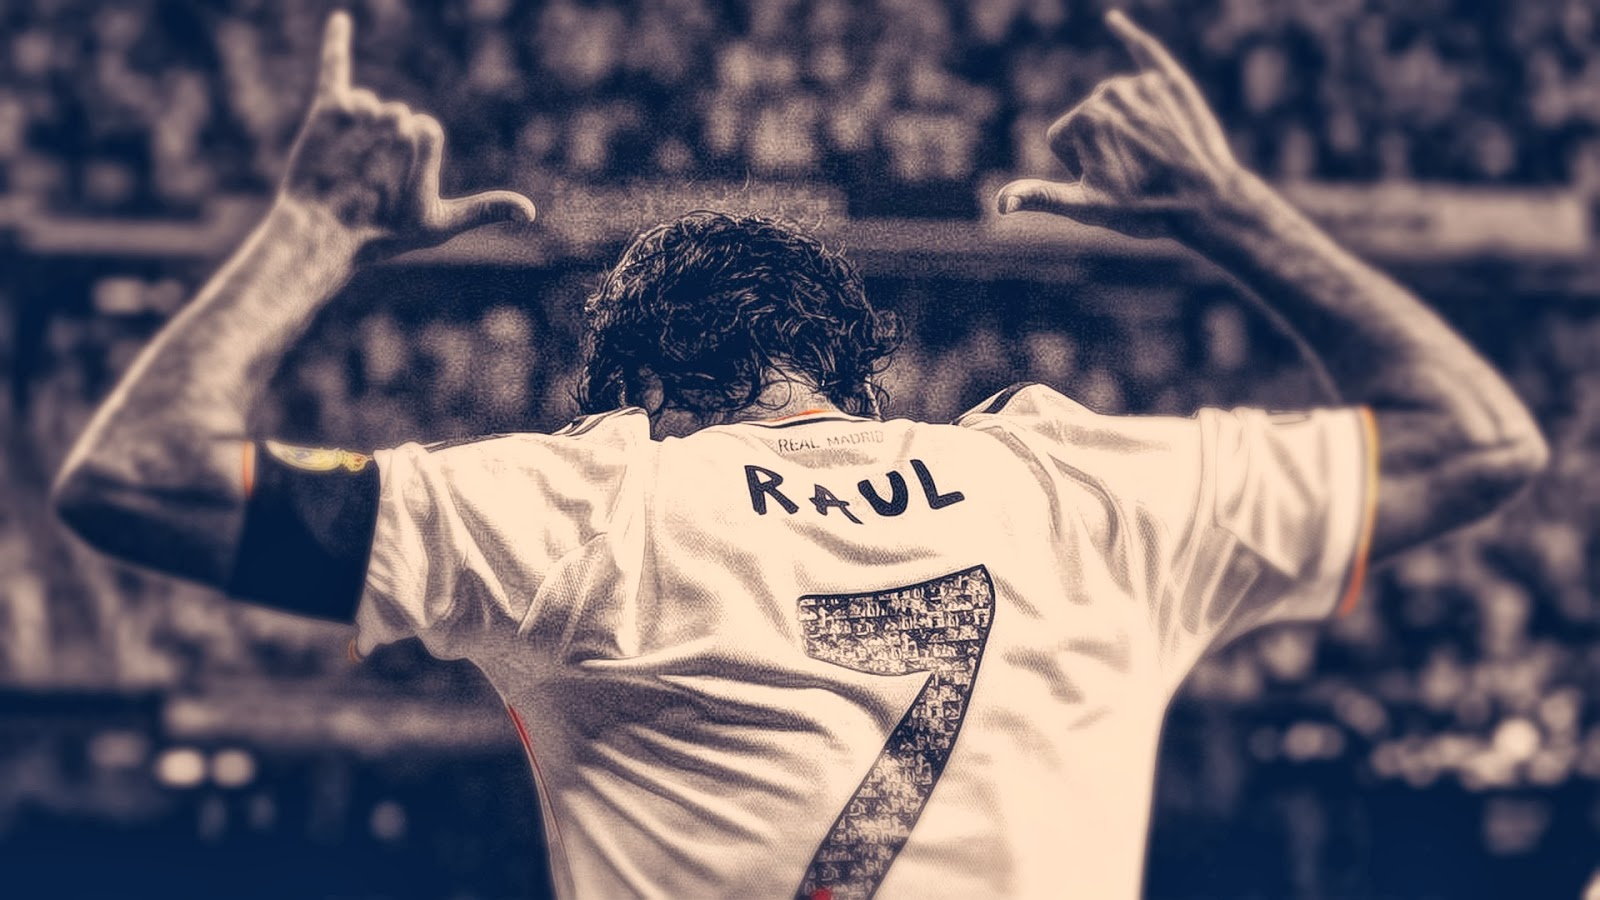 Raul gonzalez wallpaper 2013